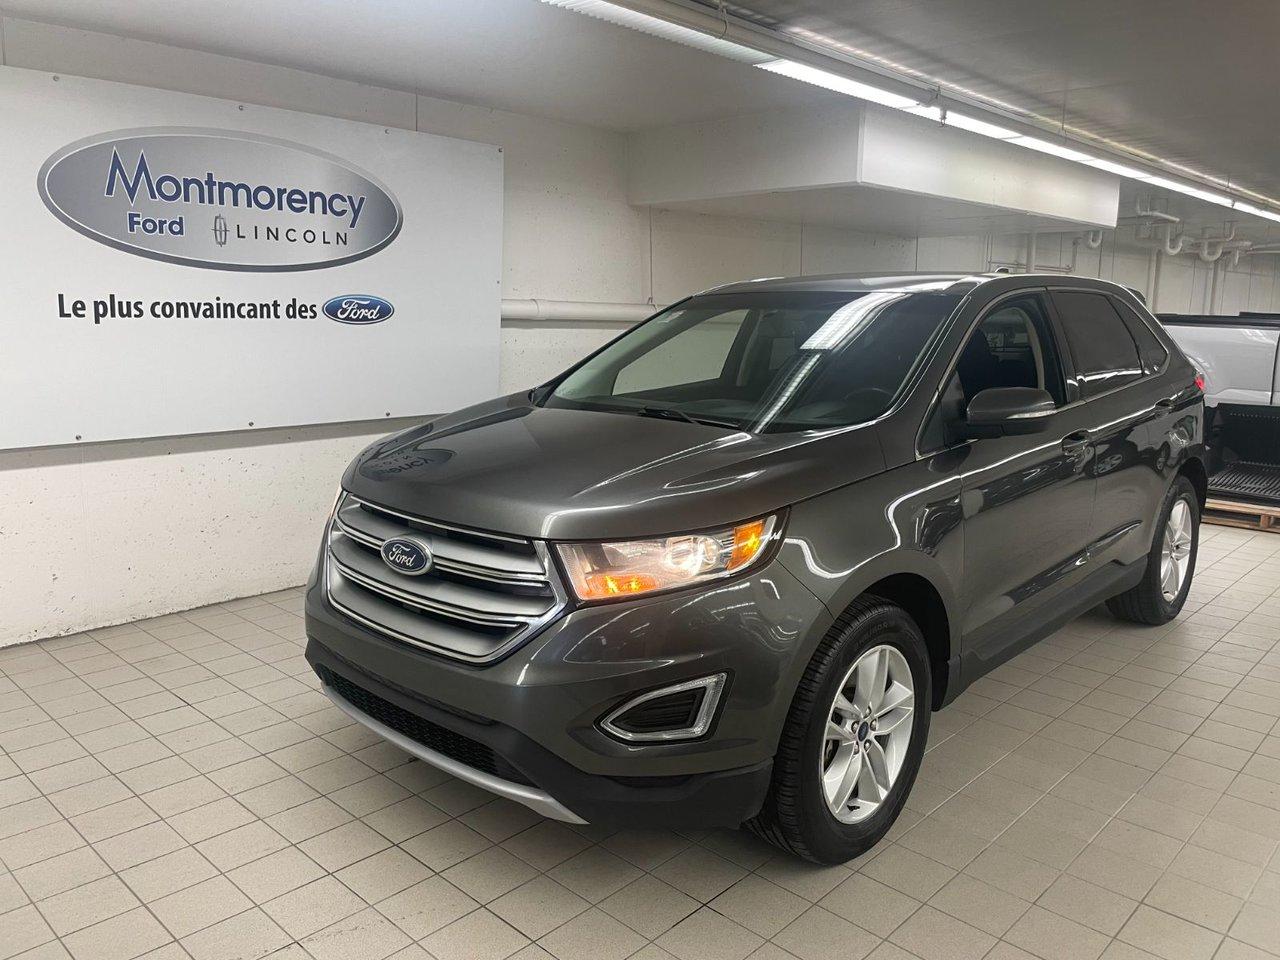 Ford Edge 2017 SEL 2.0L AWD - ÉCRAN 8 PO, CARPLAY ET ANDROID